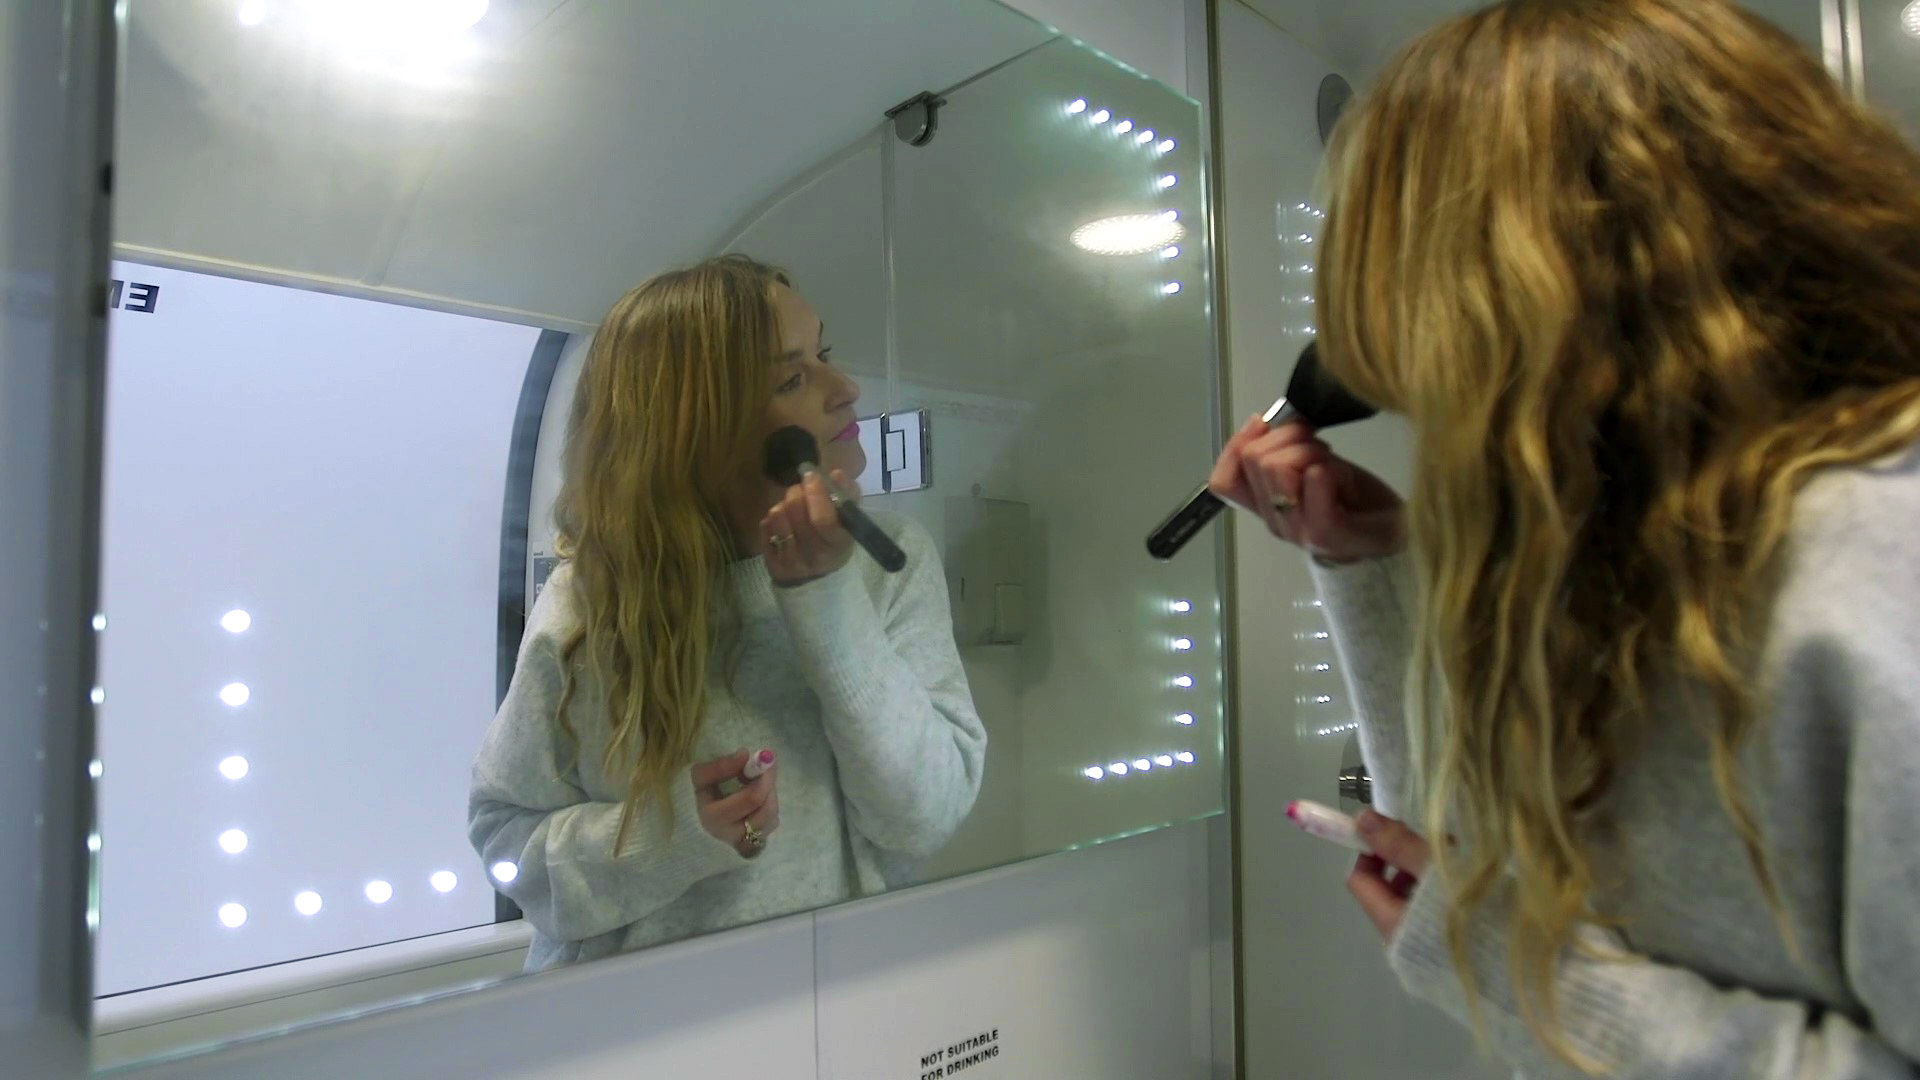 Bedroam-bathroom-mirror.jpg